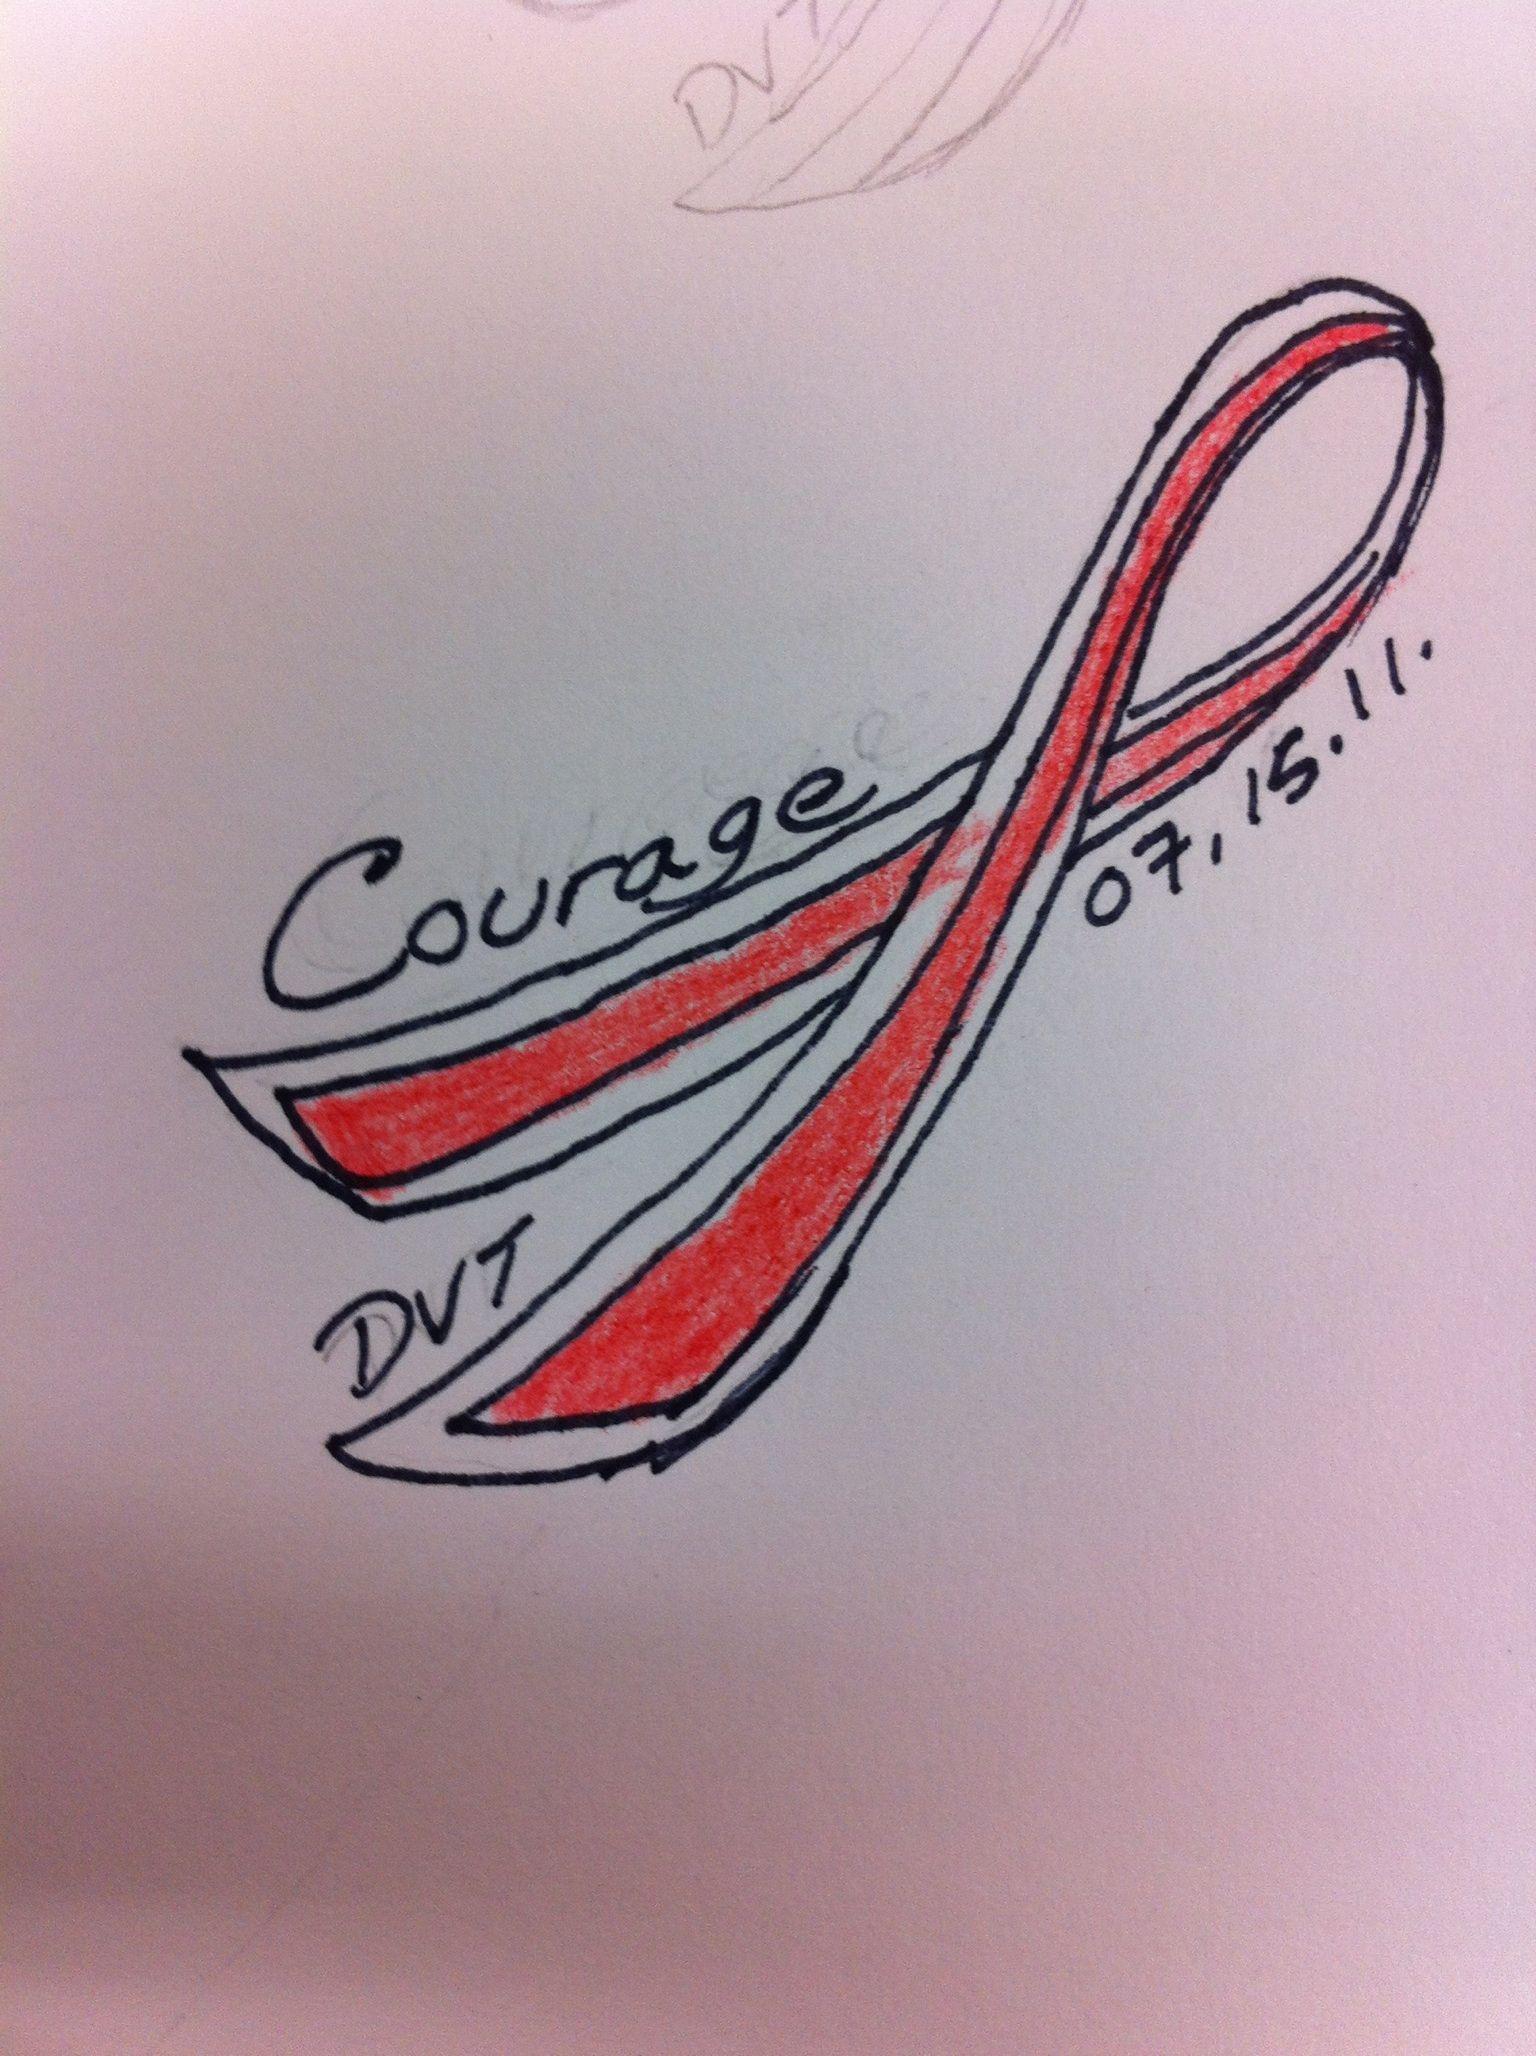 My tattoo im getting in 4 months dvt awareness dvt